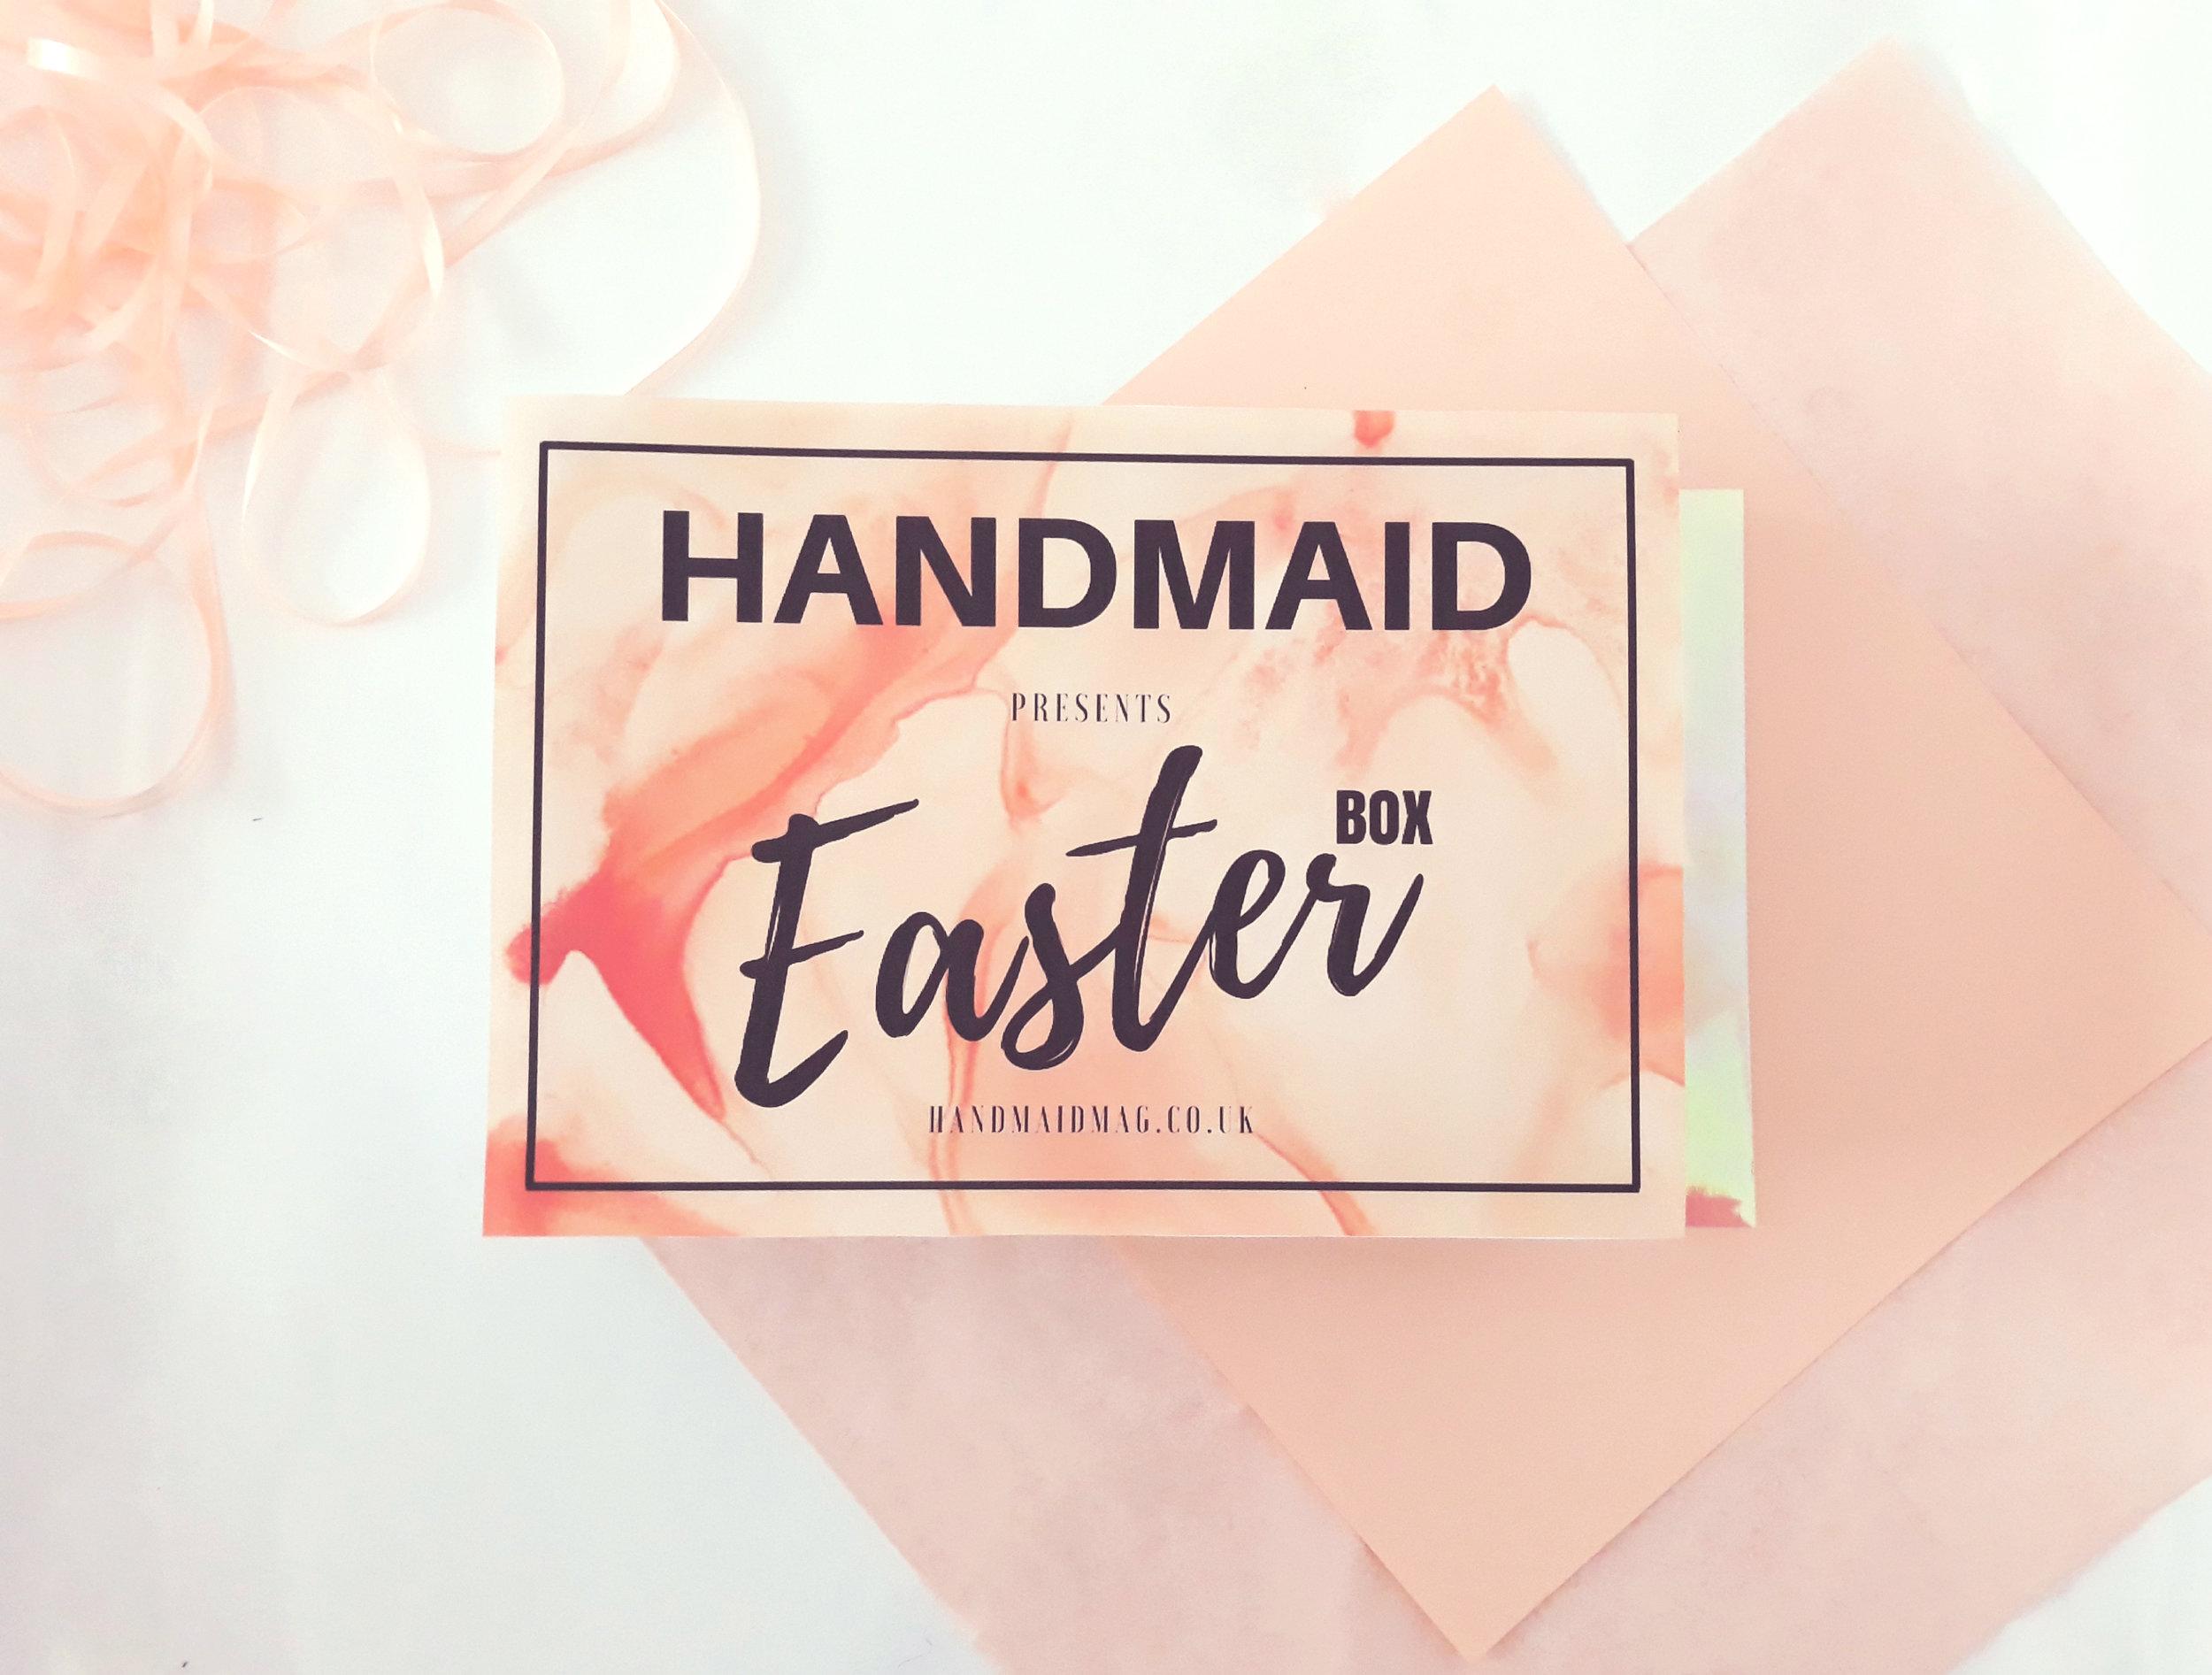 Easter Box pic1.2.jpg